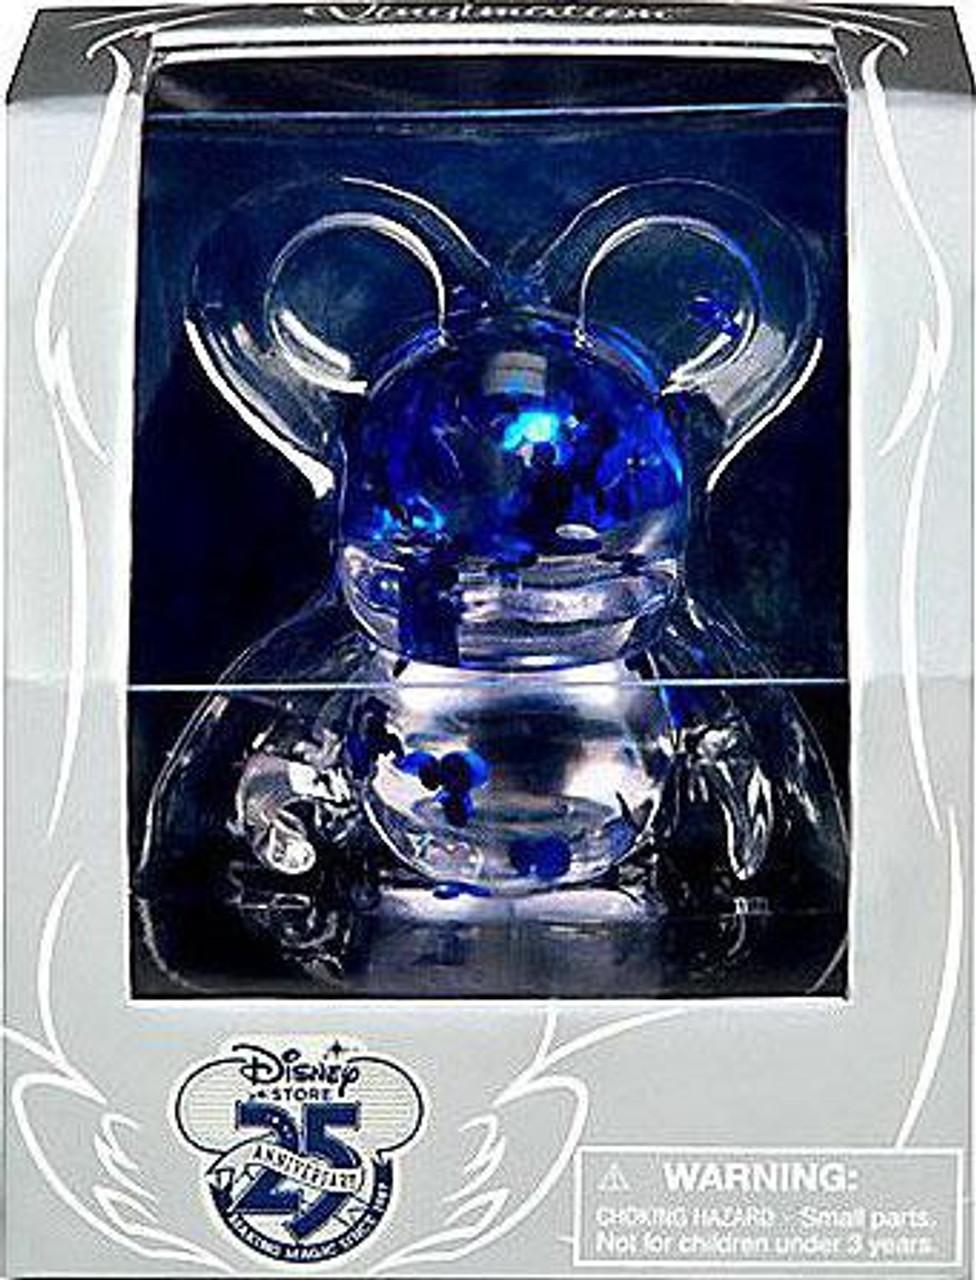 Disney Vinylmation Mickey Mouse Exclusive 3-Inch Vinyl Figure